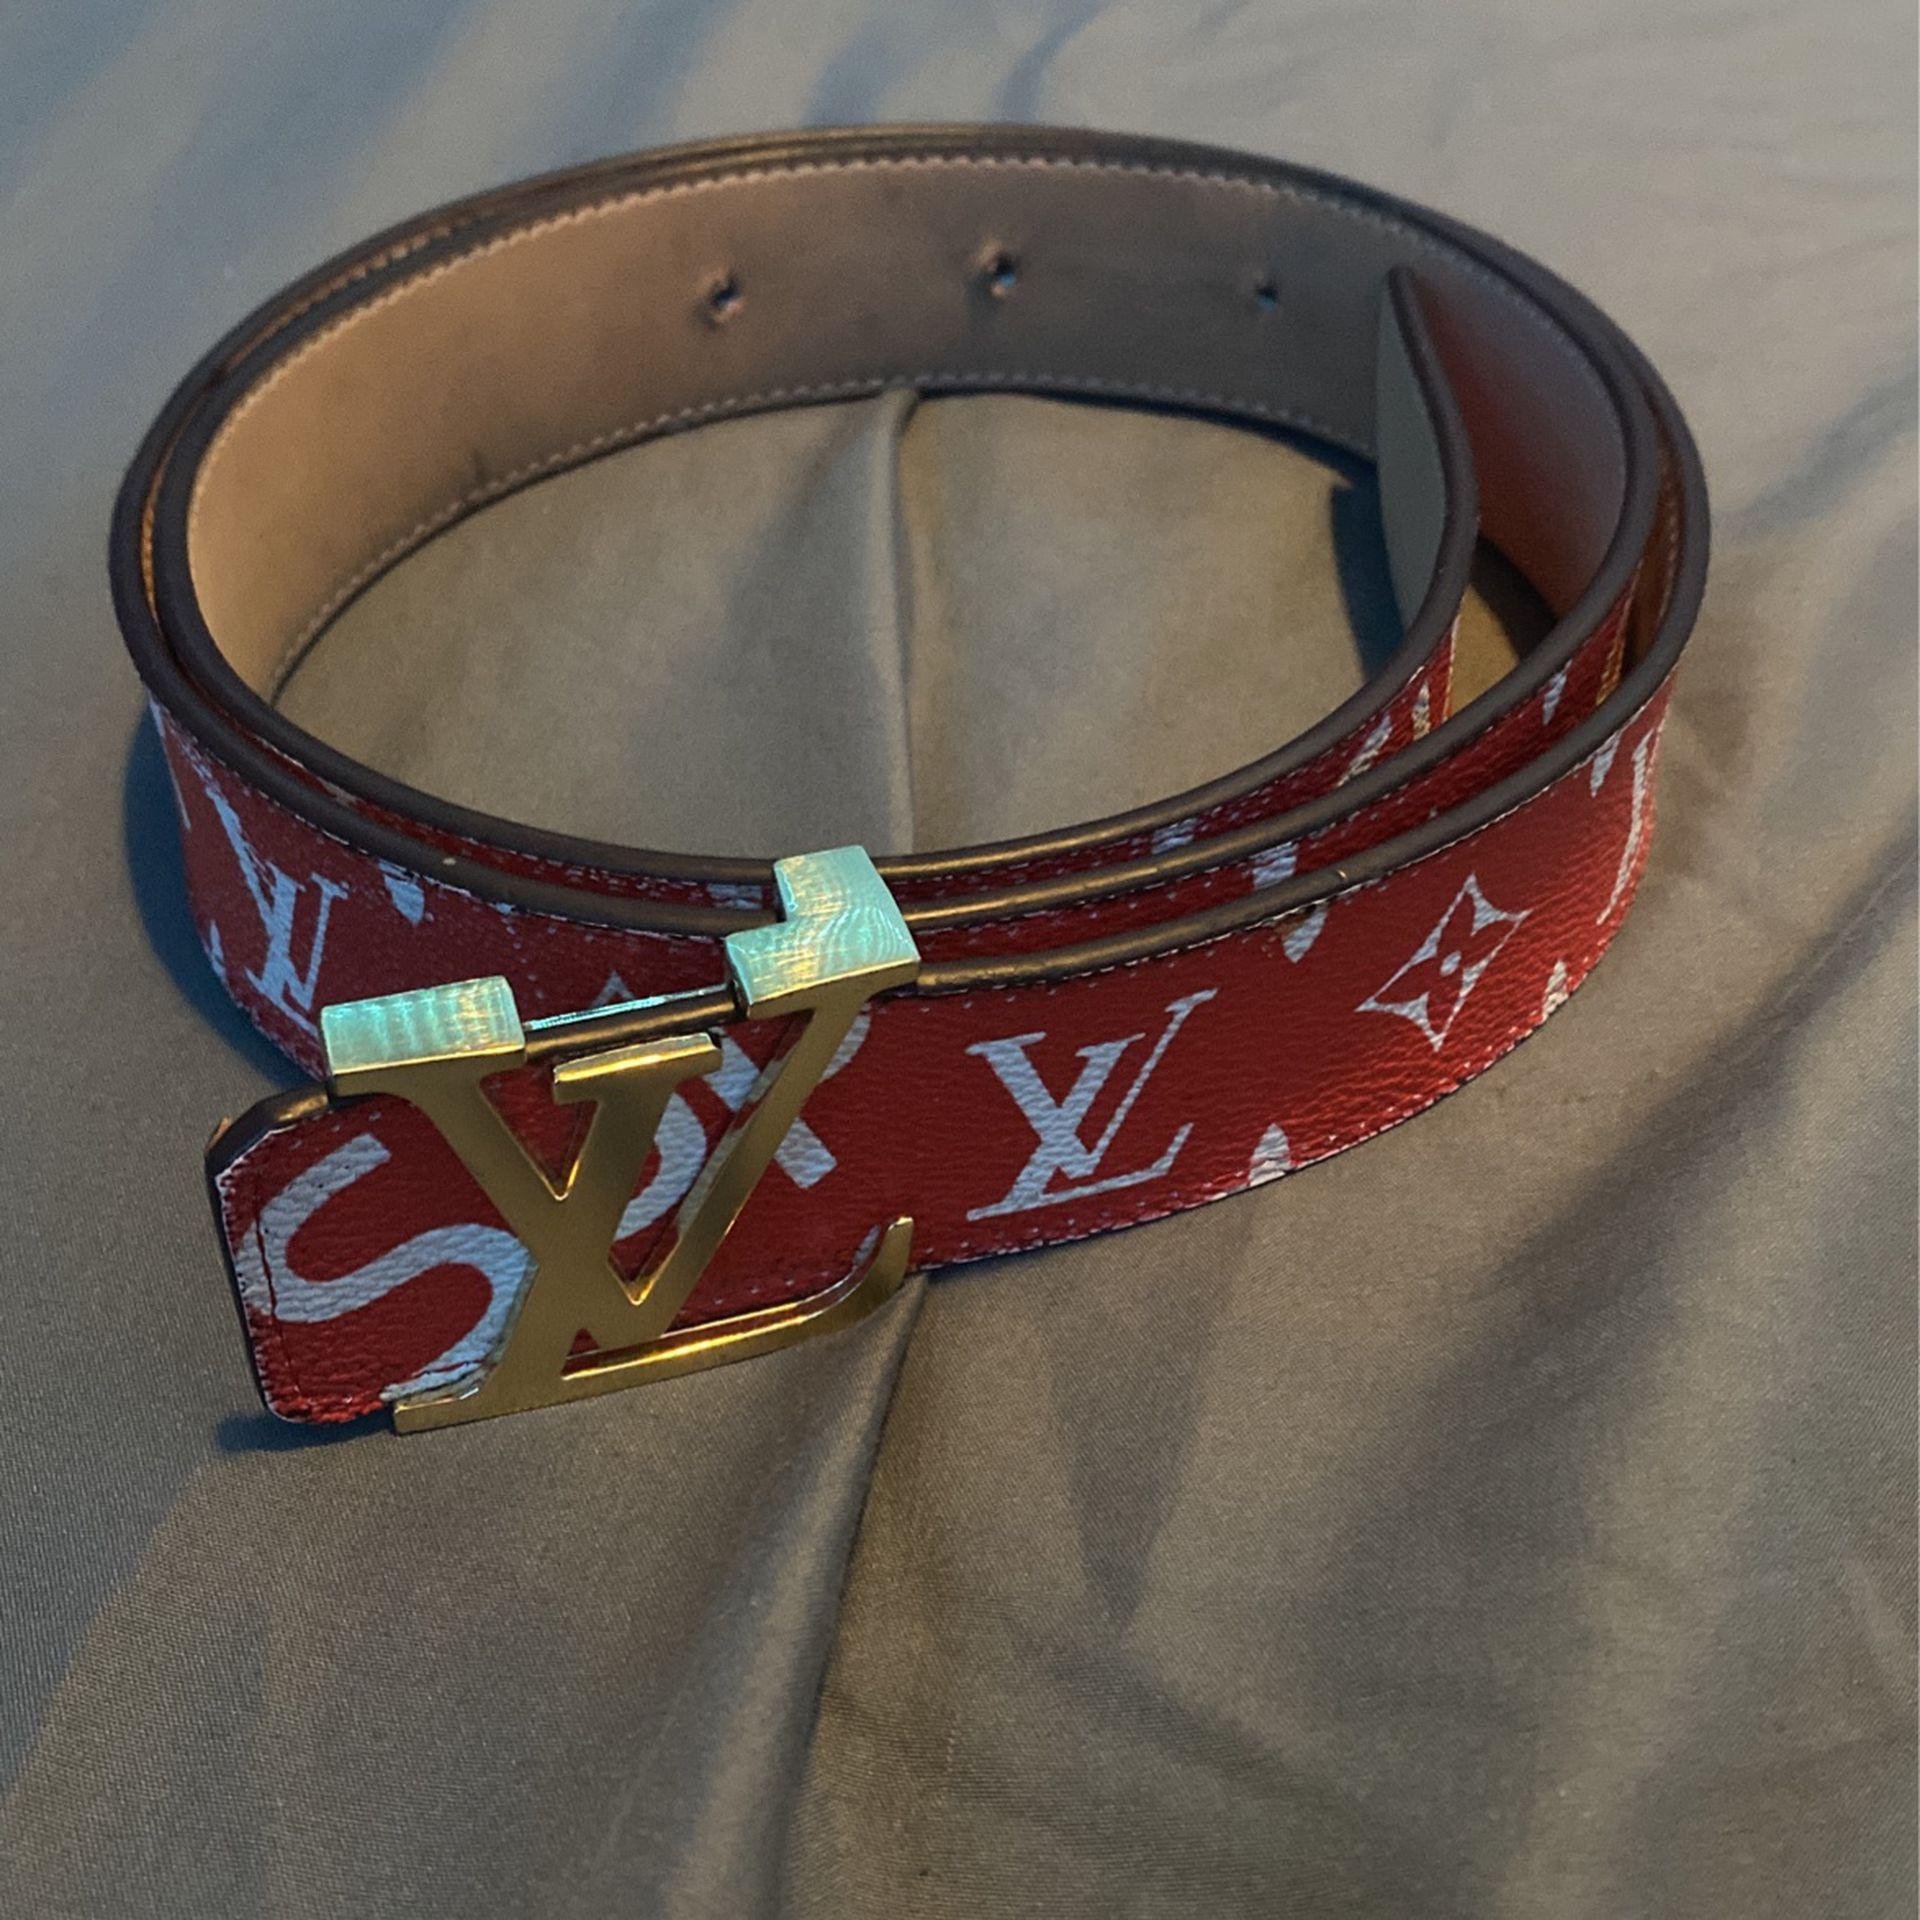 Supreme X Louis Vuitton Belt